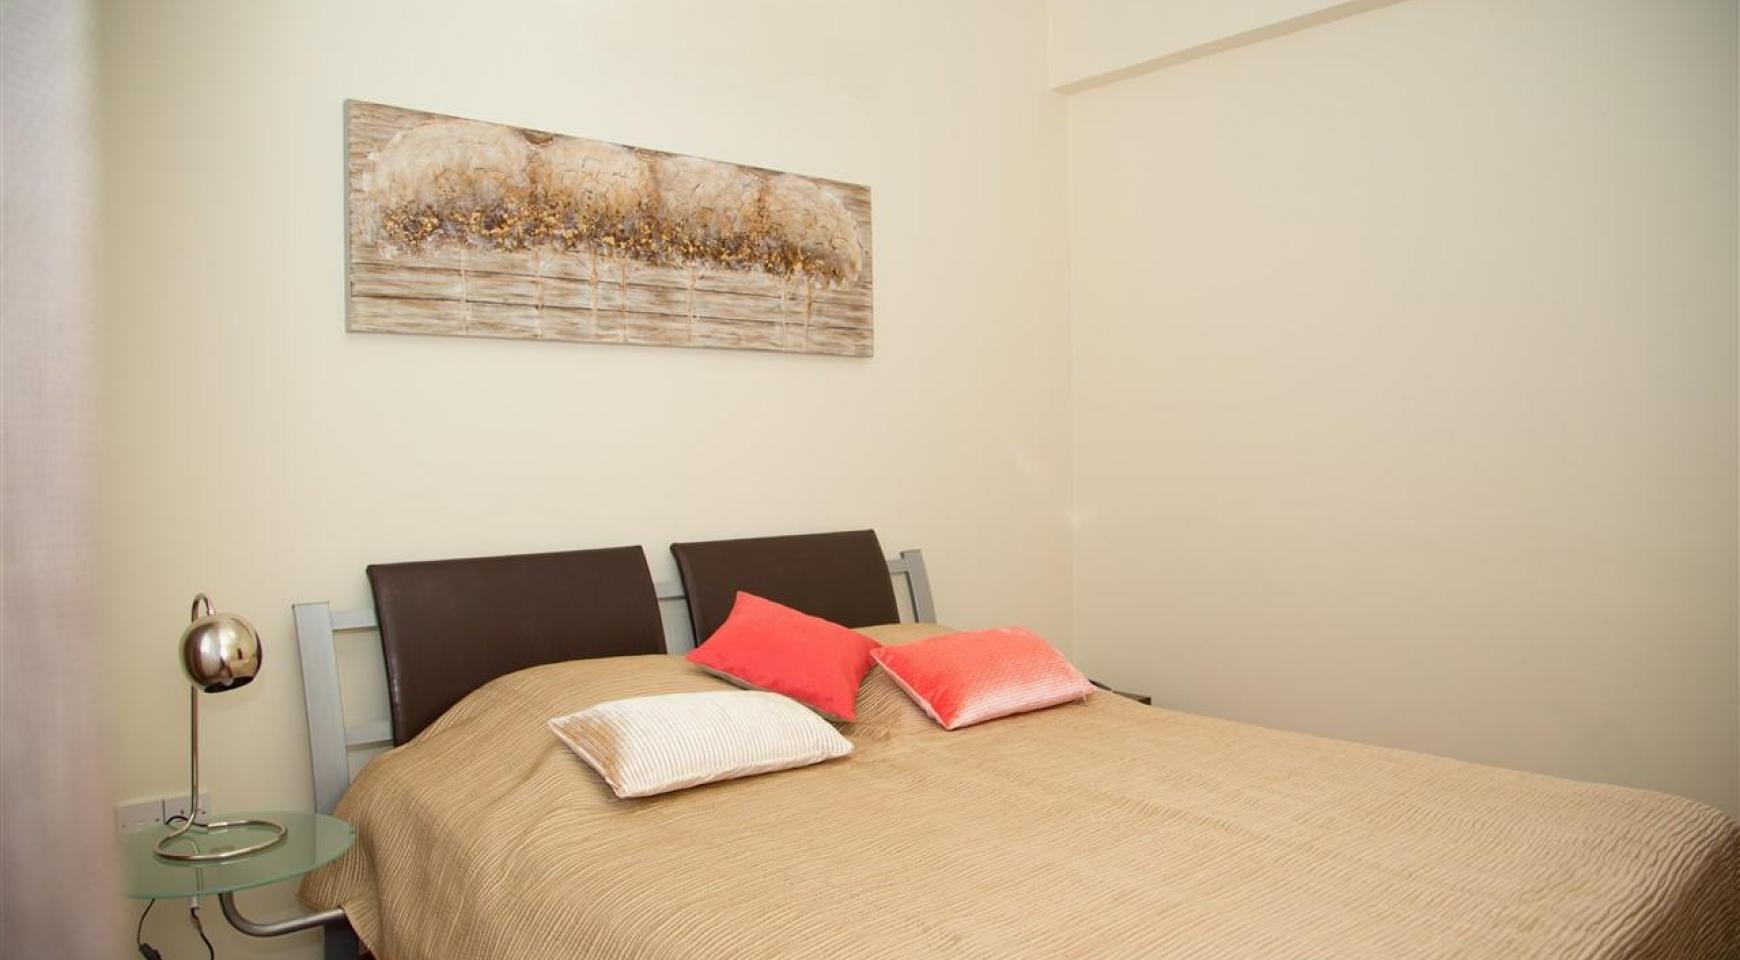 2 Bedroom Apartment Mesogios Iris 304 in the Complex near the Sea - 17